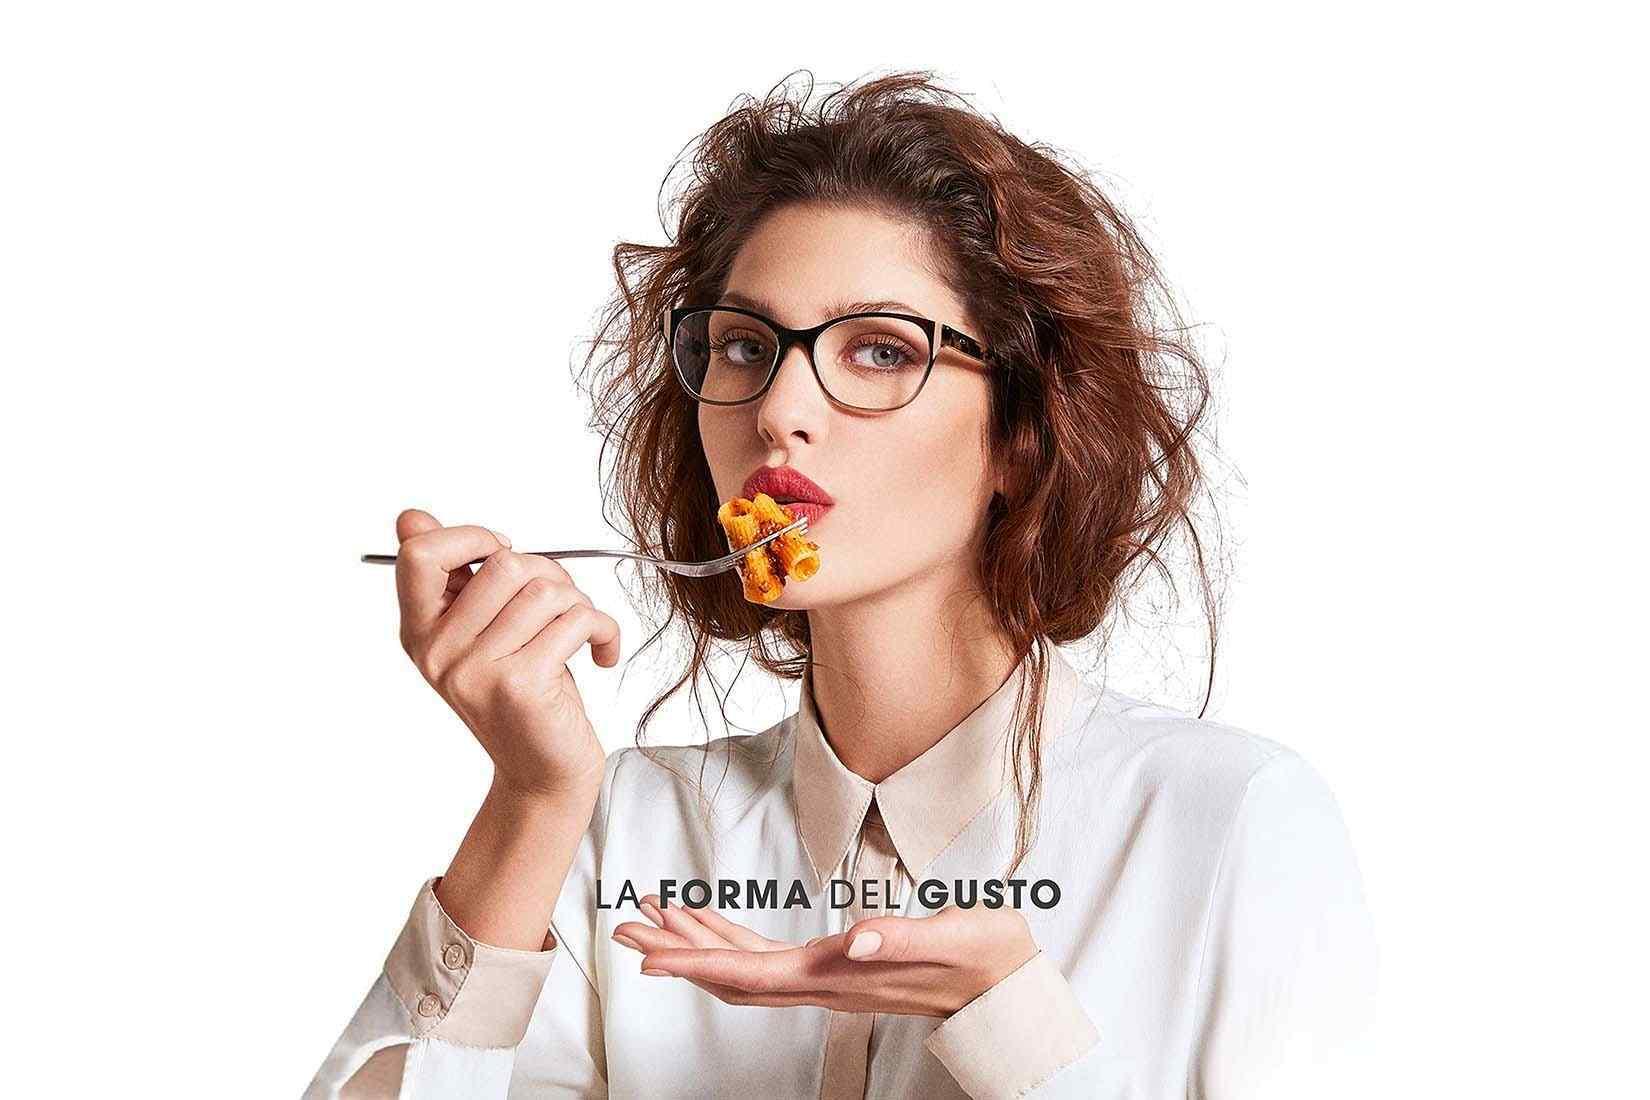 Vanni spectacles: Italian Food 20185 1650x1100